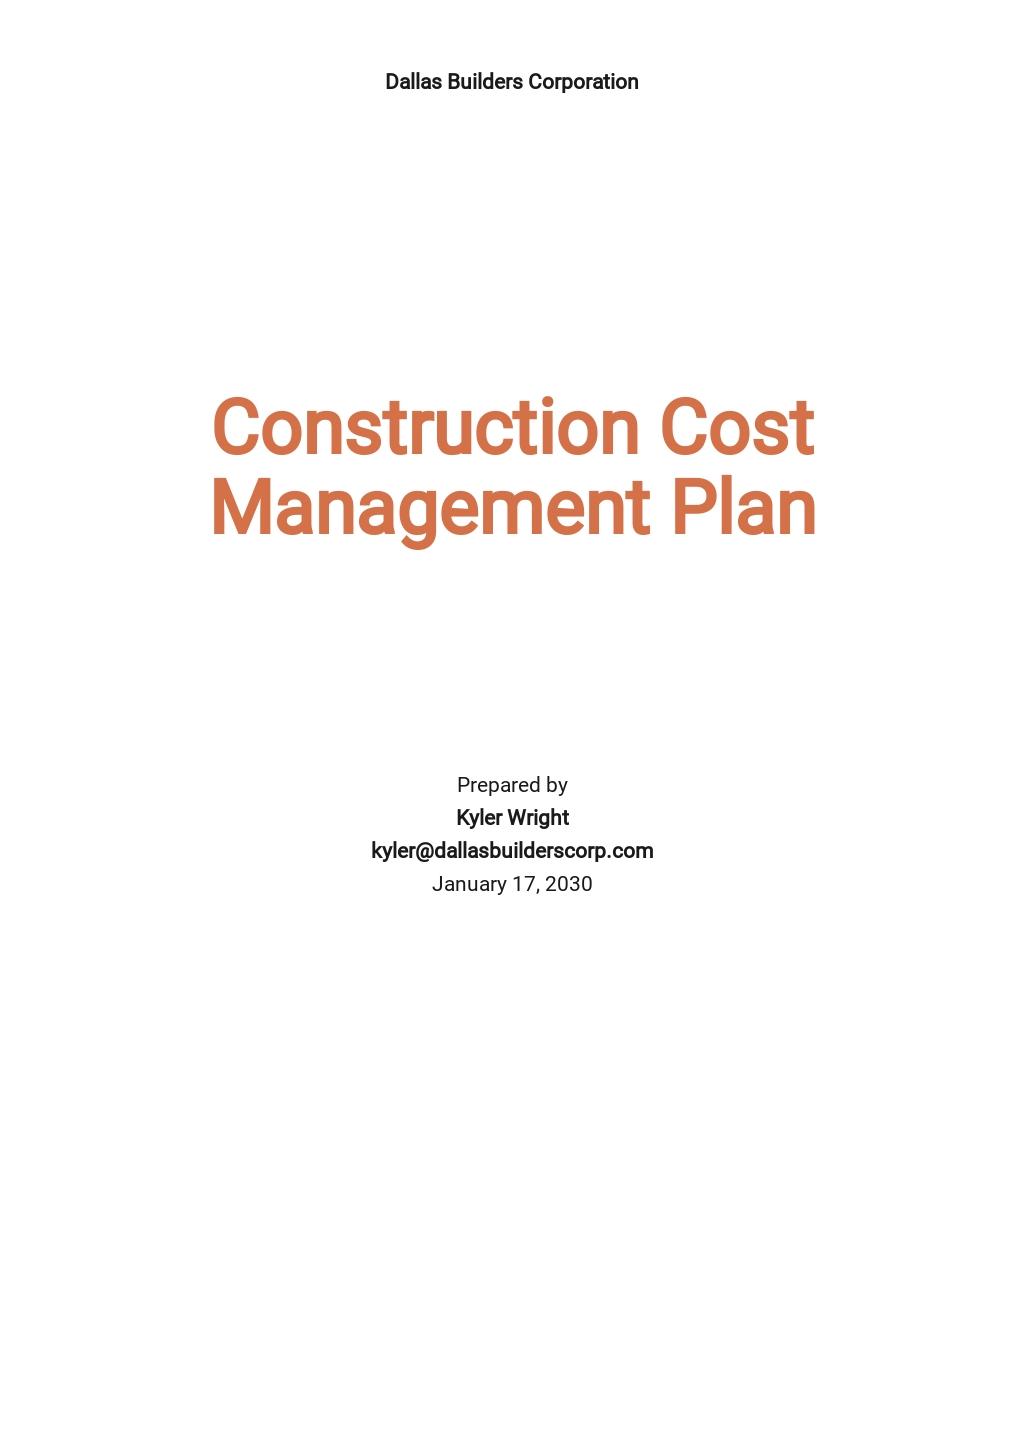 Construction Cost Management Plan Template.jpe